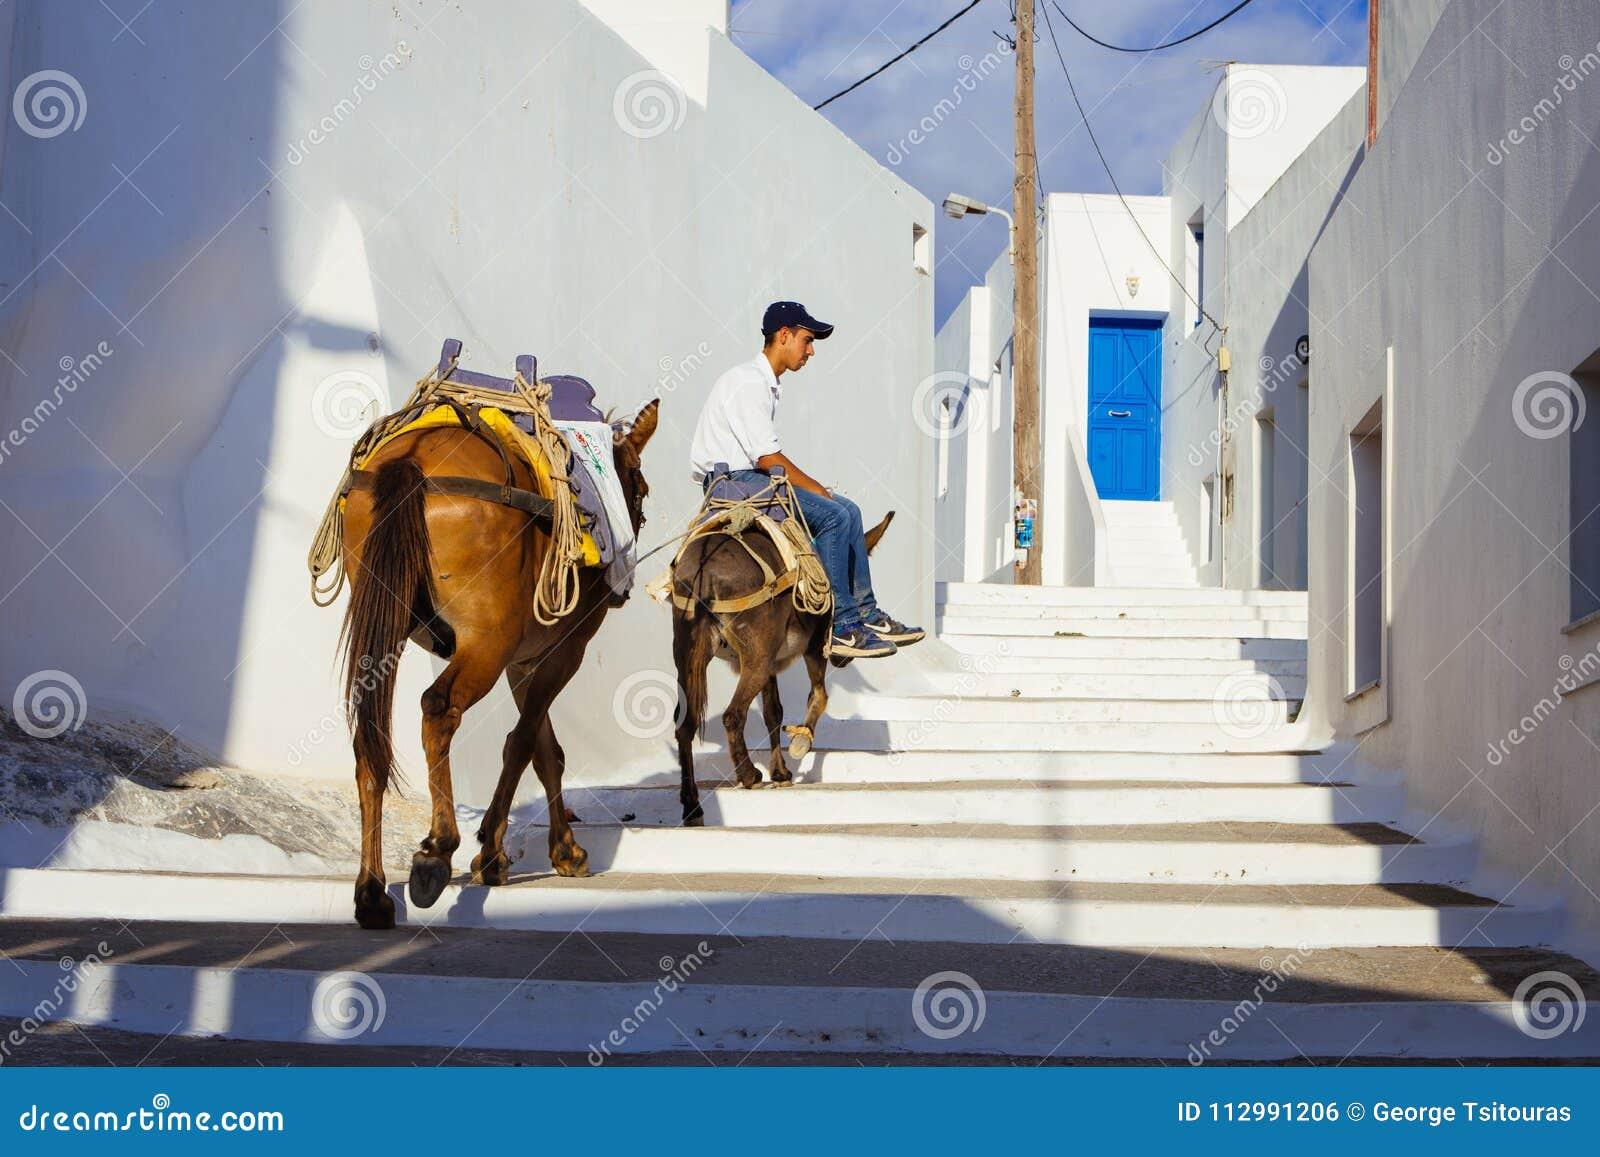 Lagada of Amorgos,Greece-August 2 ,2017.A small kid riding his d